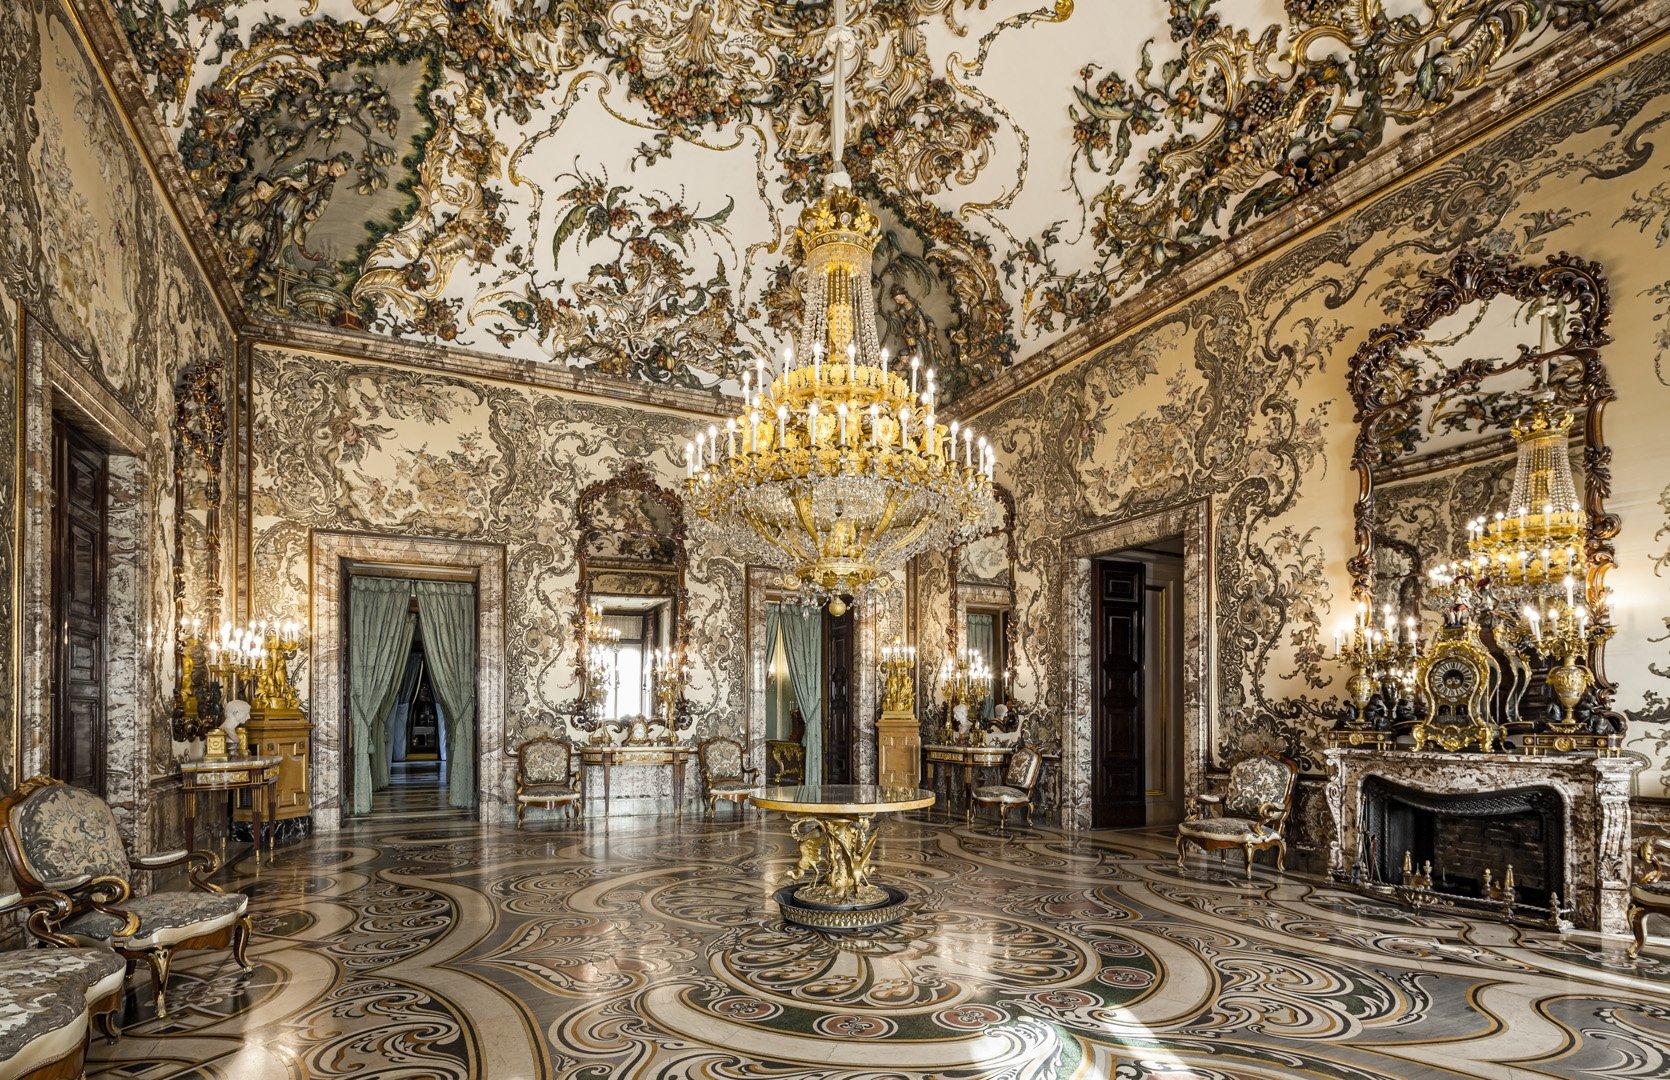 Patrimonio nacional on twitter el palacio real de madrid for Arquitectura de interiores madrid